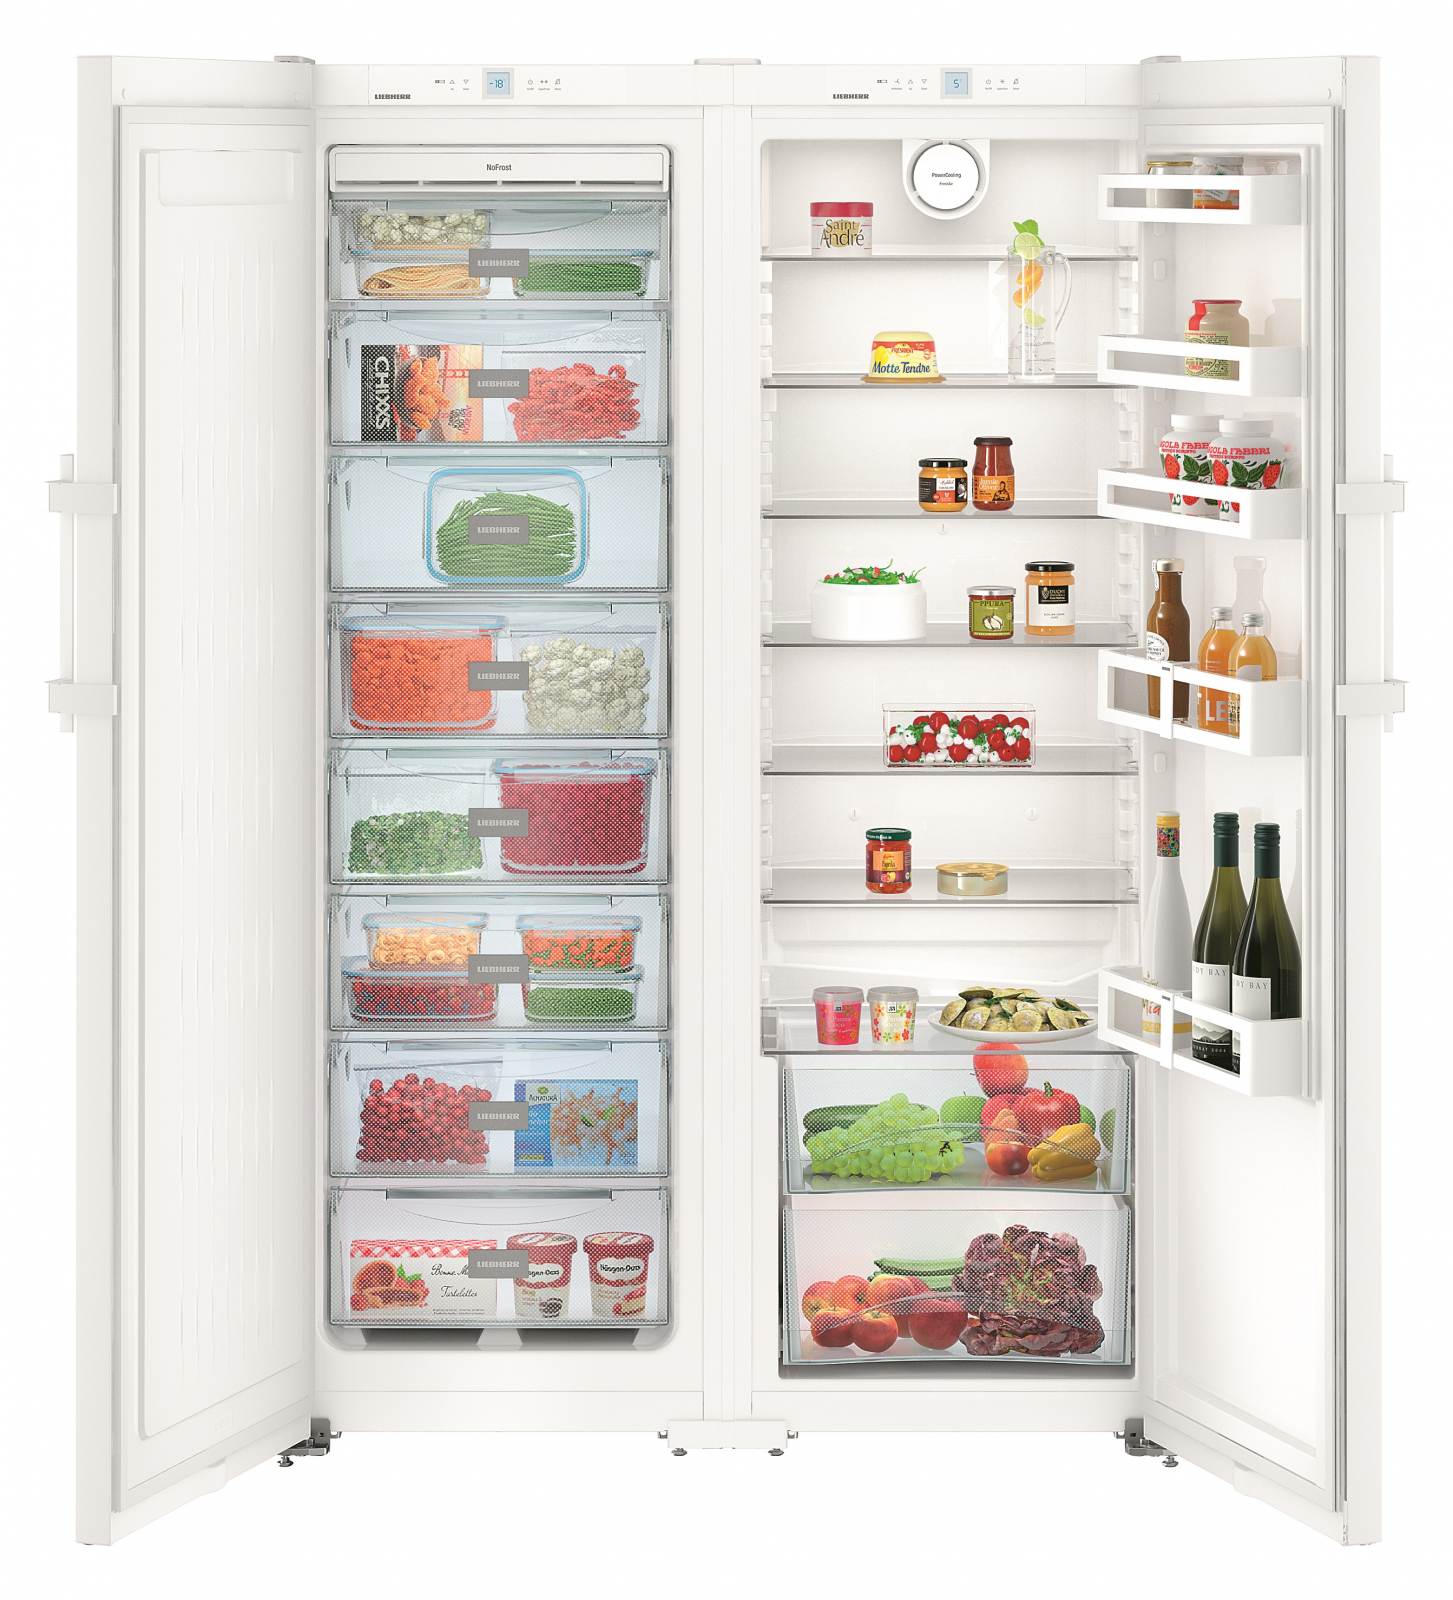 Side-by-side холодильник Liebherr SBS 7242 купить украина